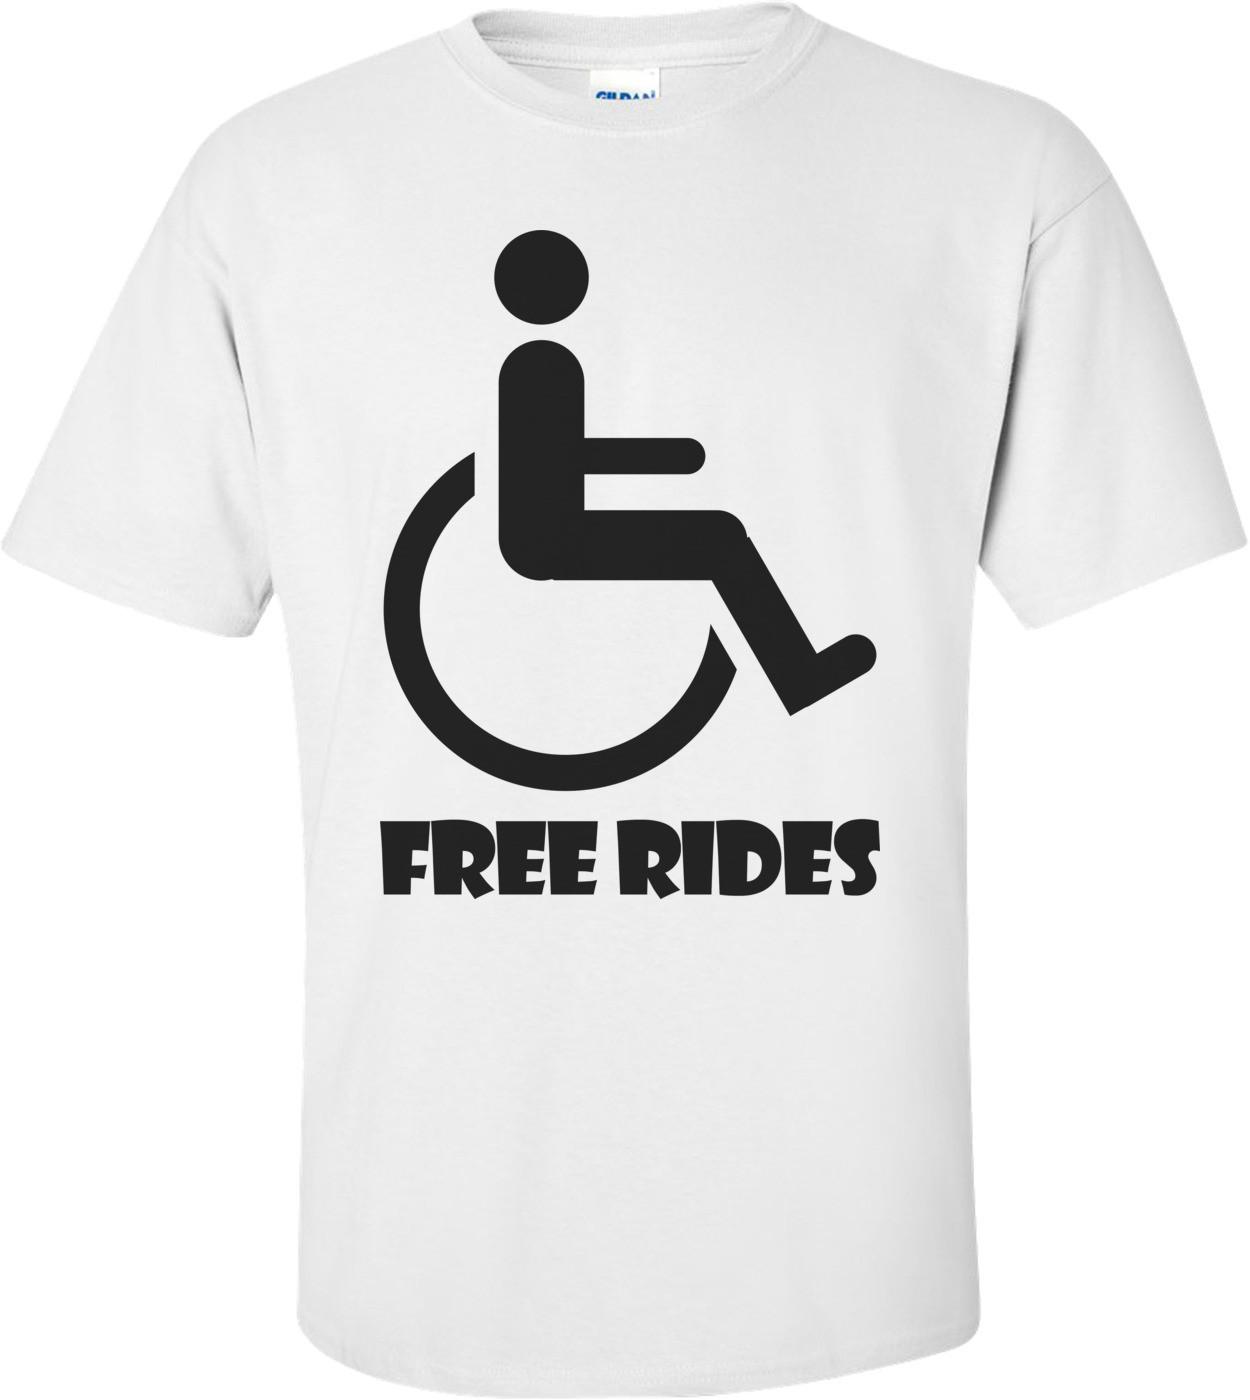 Free Rides T-shirt